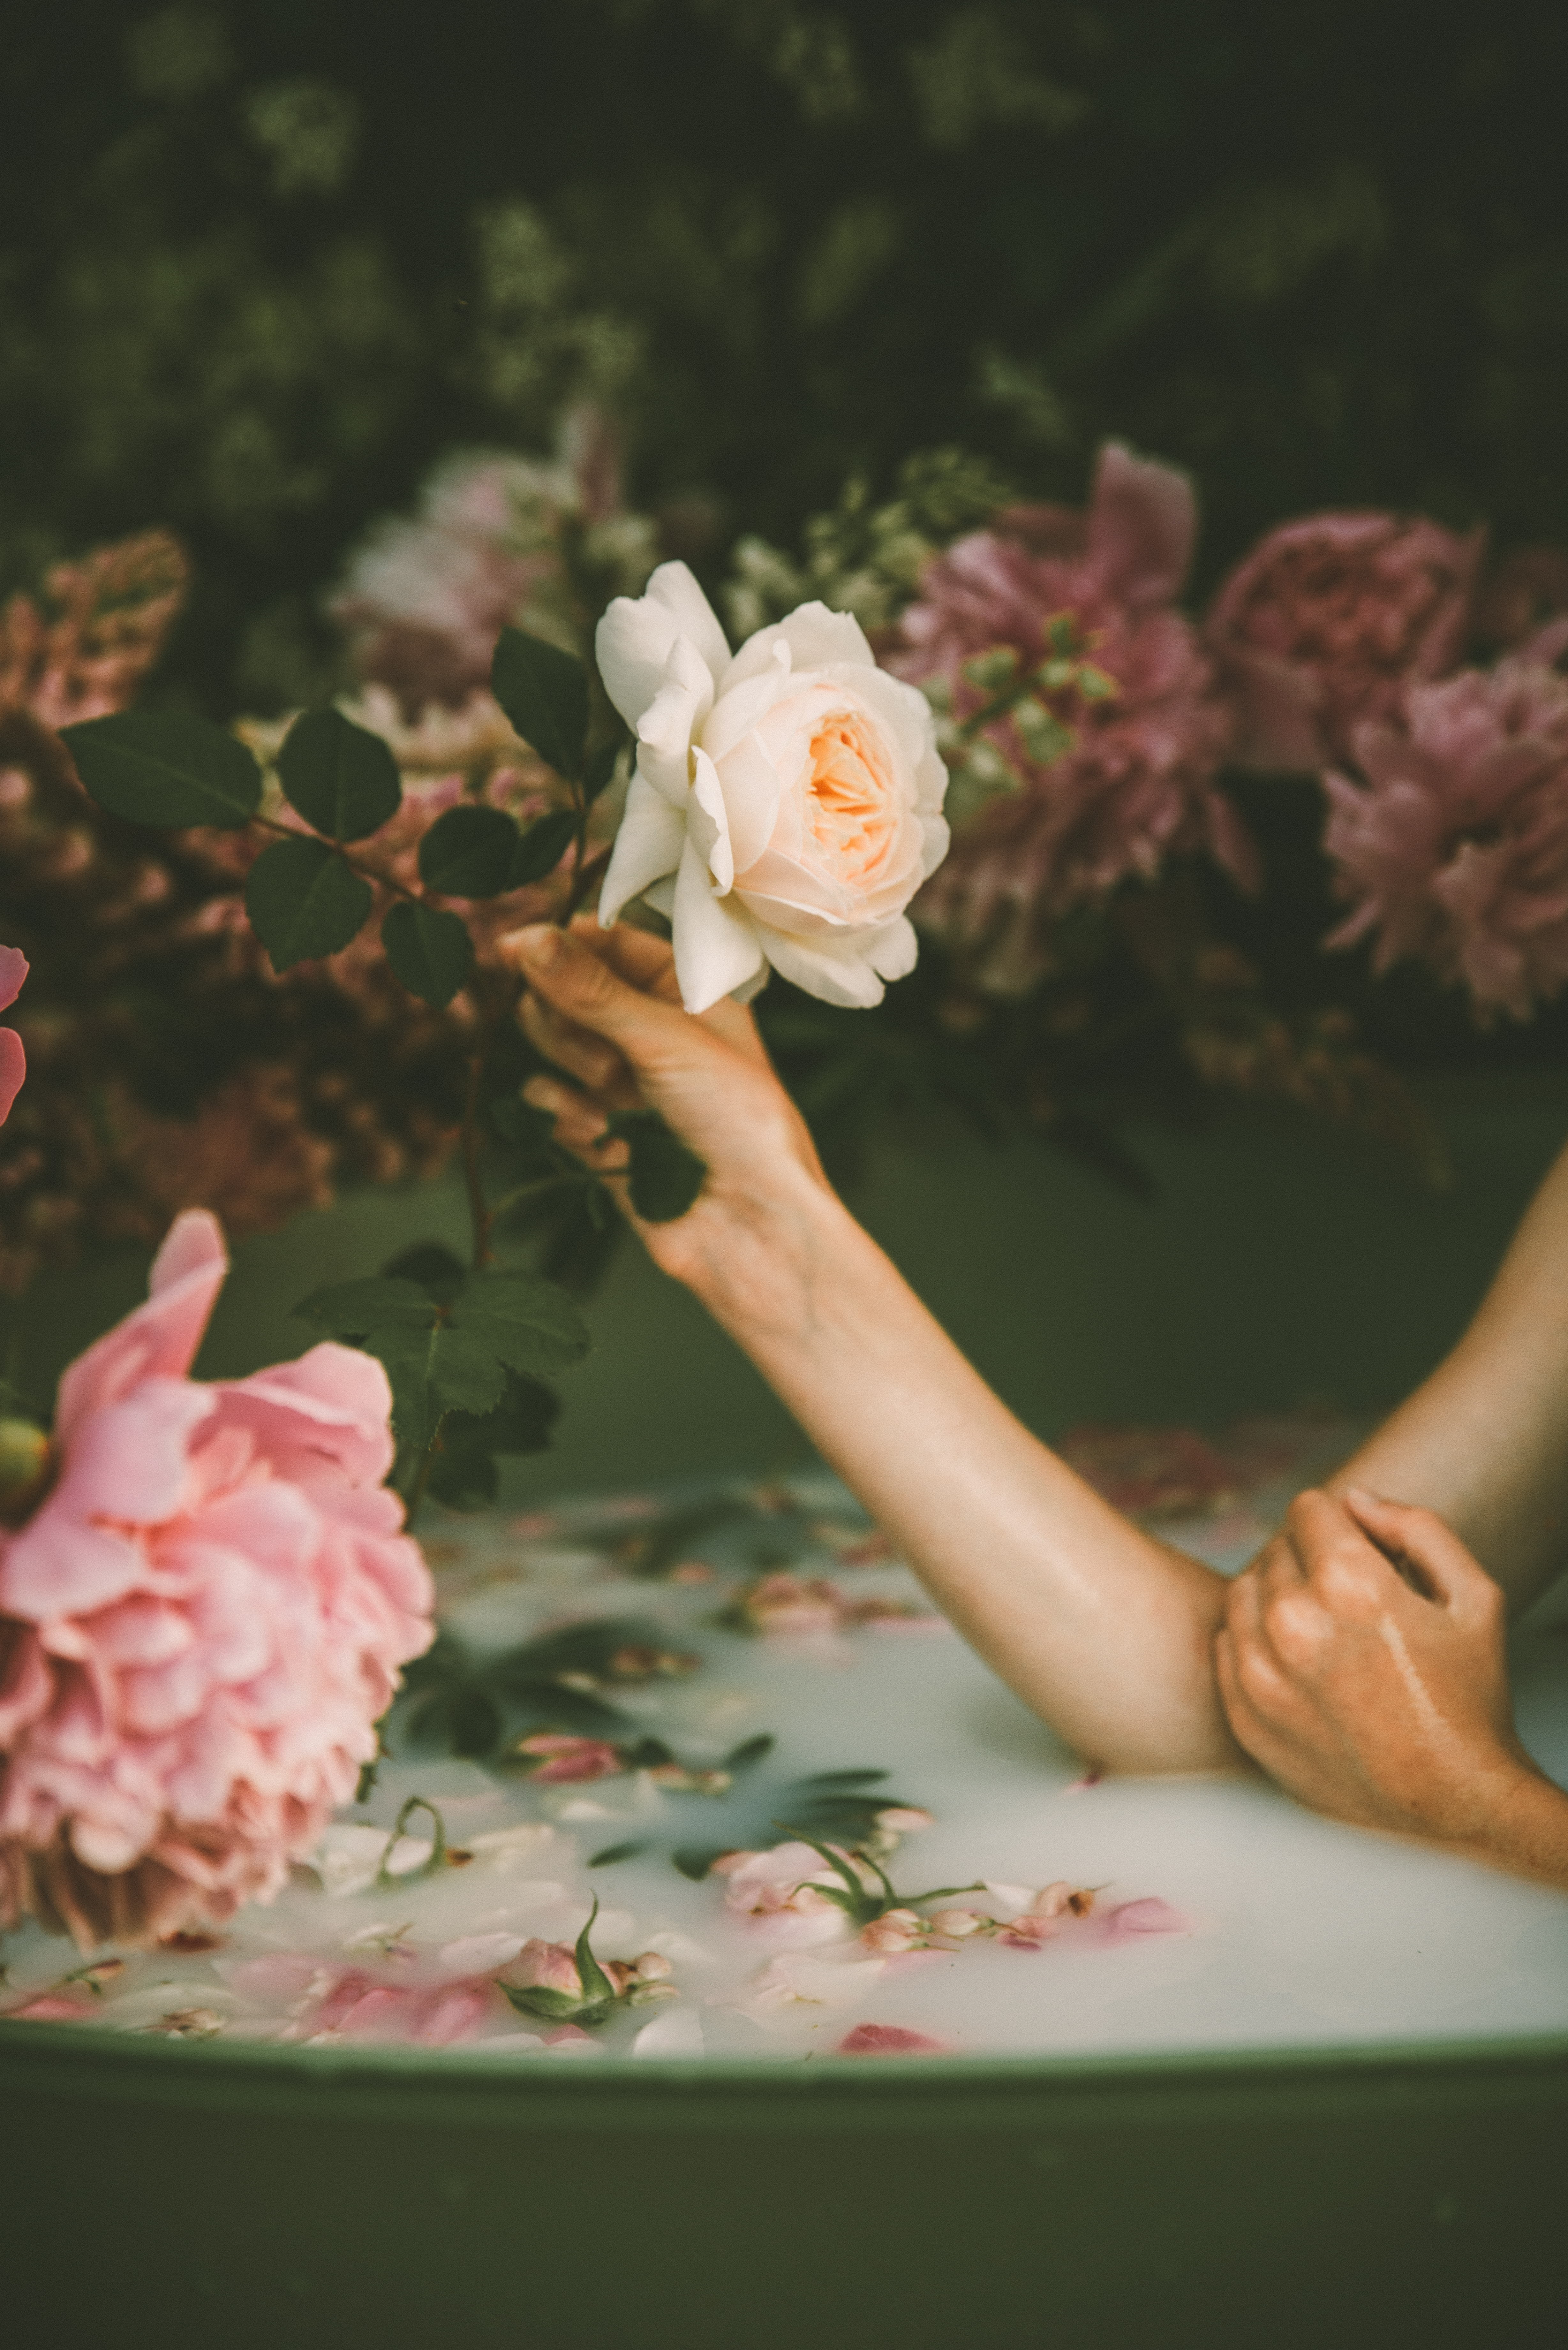 bain-hydratation-fleur